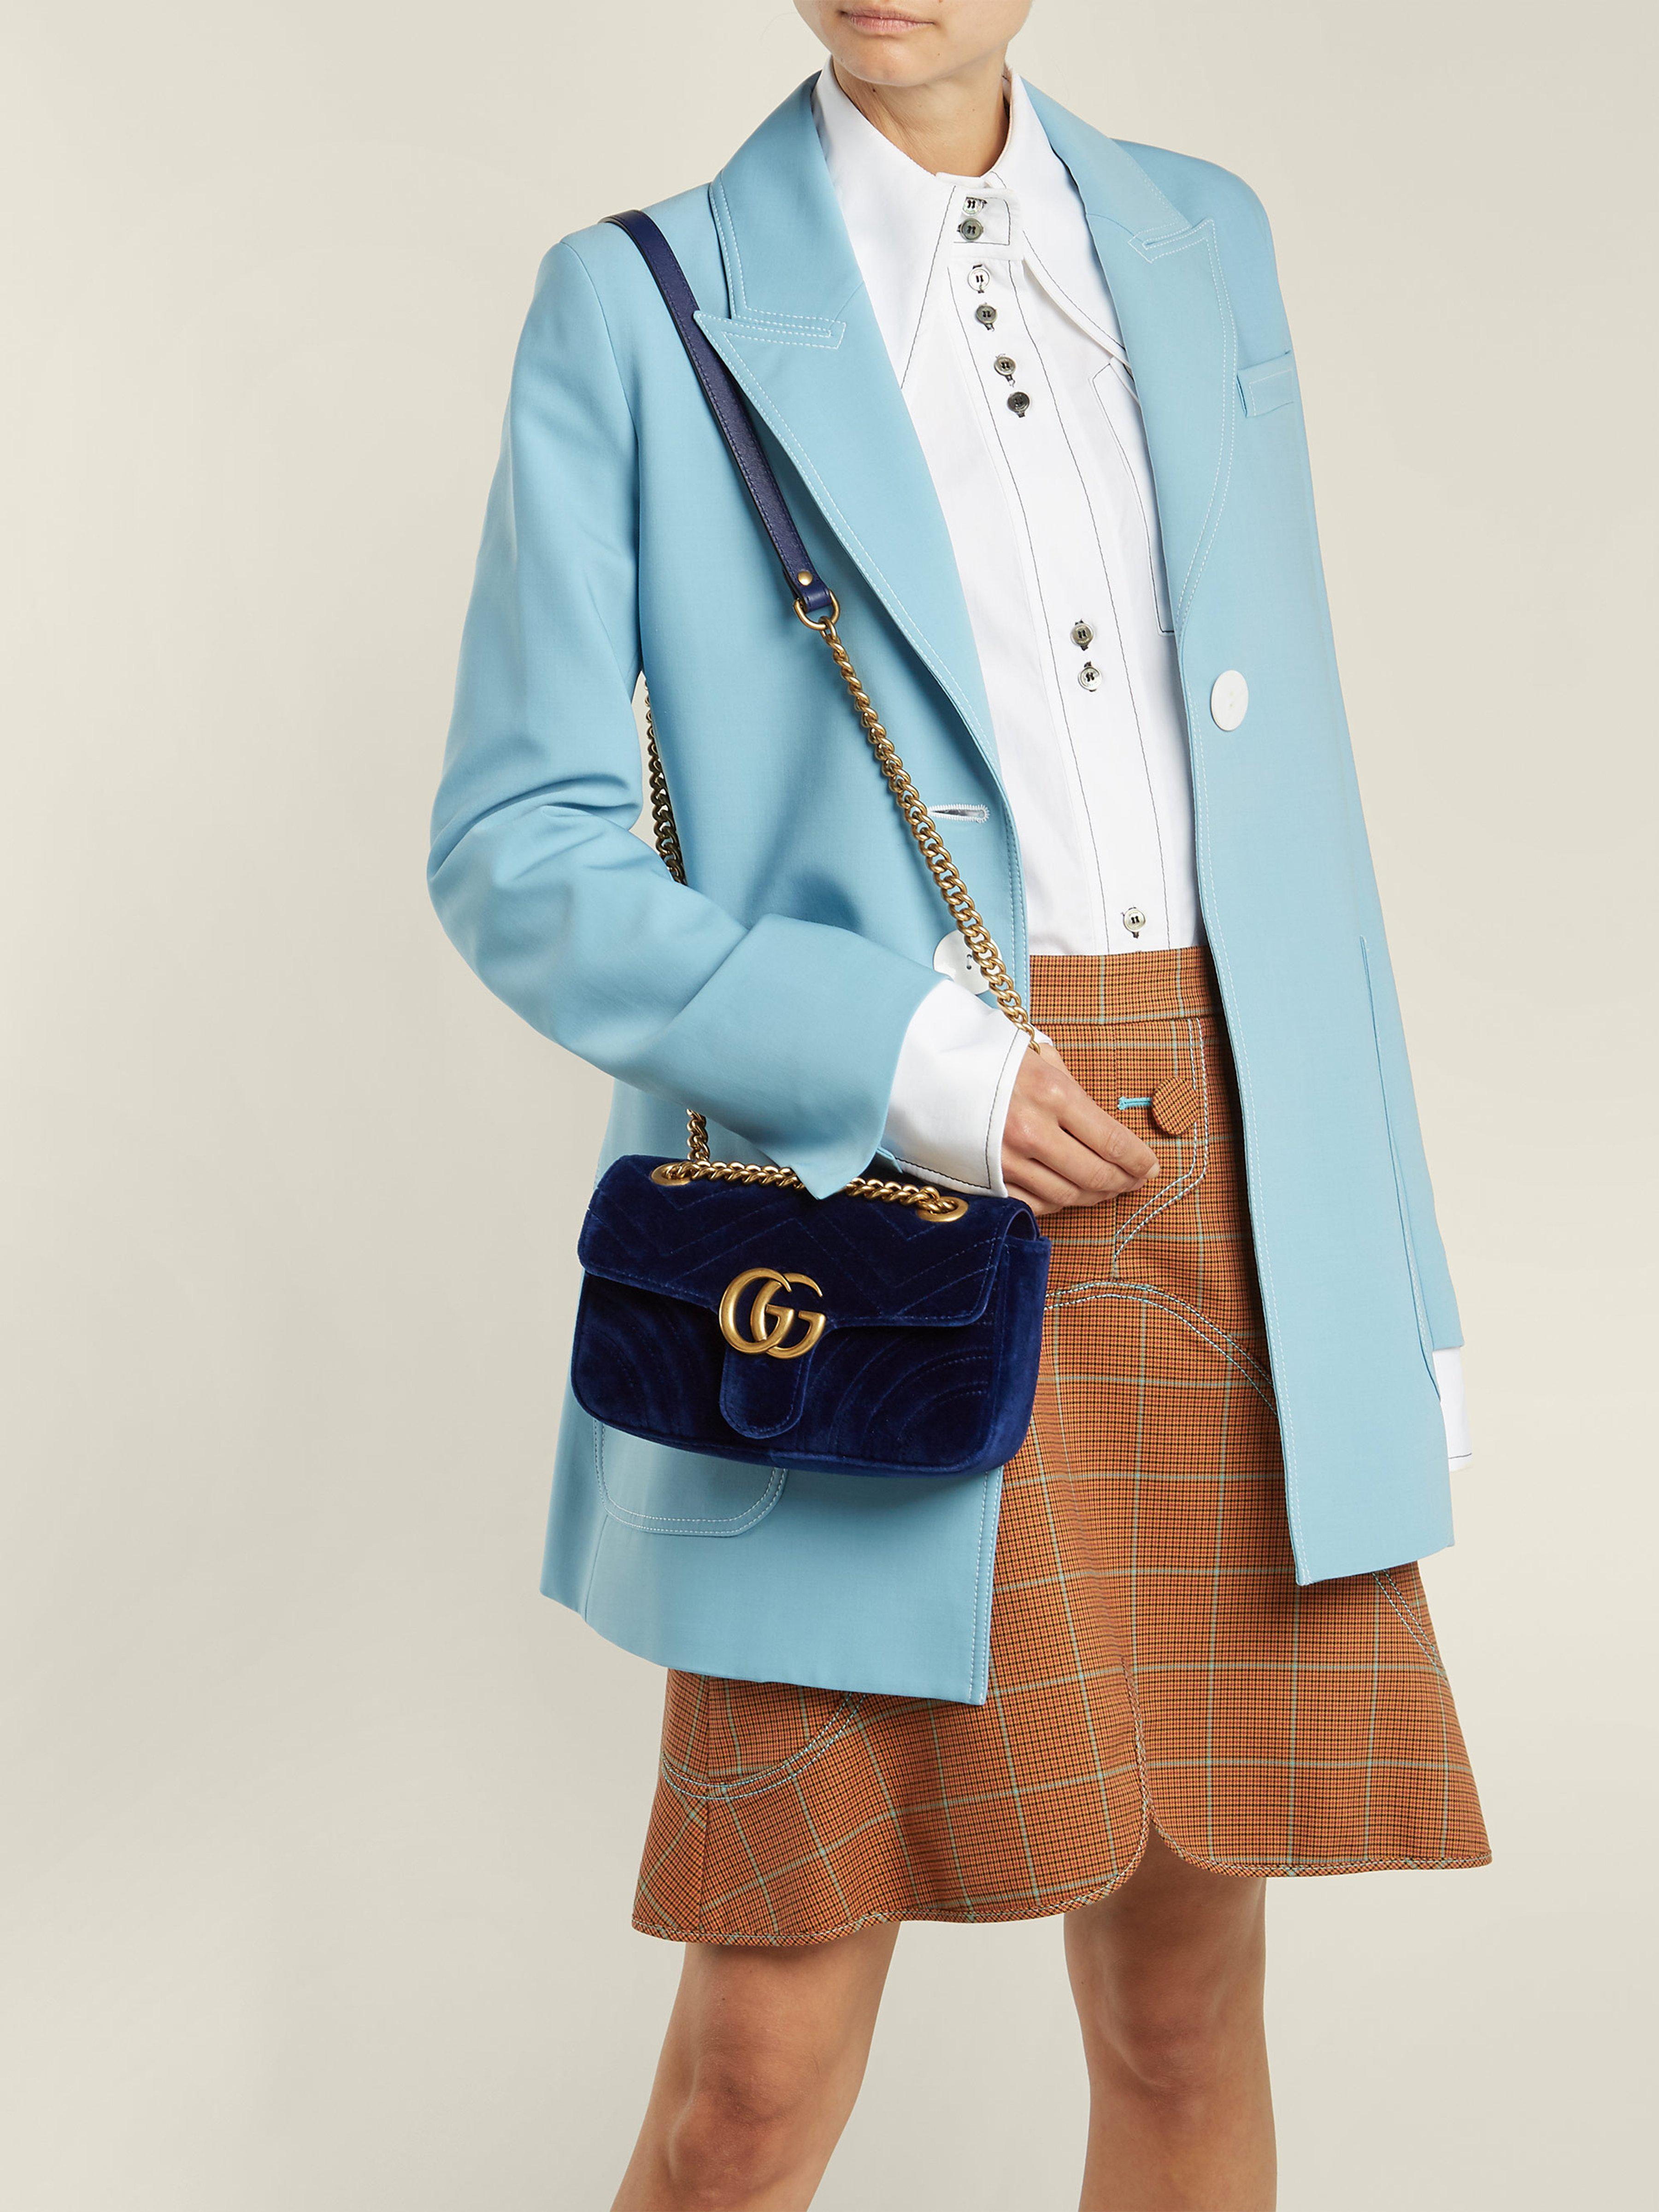 776163193fc7 Gucci - Blue Gg Marmont Mini Quilted Velvet Cross Body Bag - Lyst. View  fullscreen